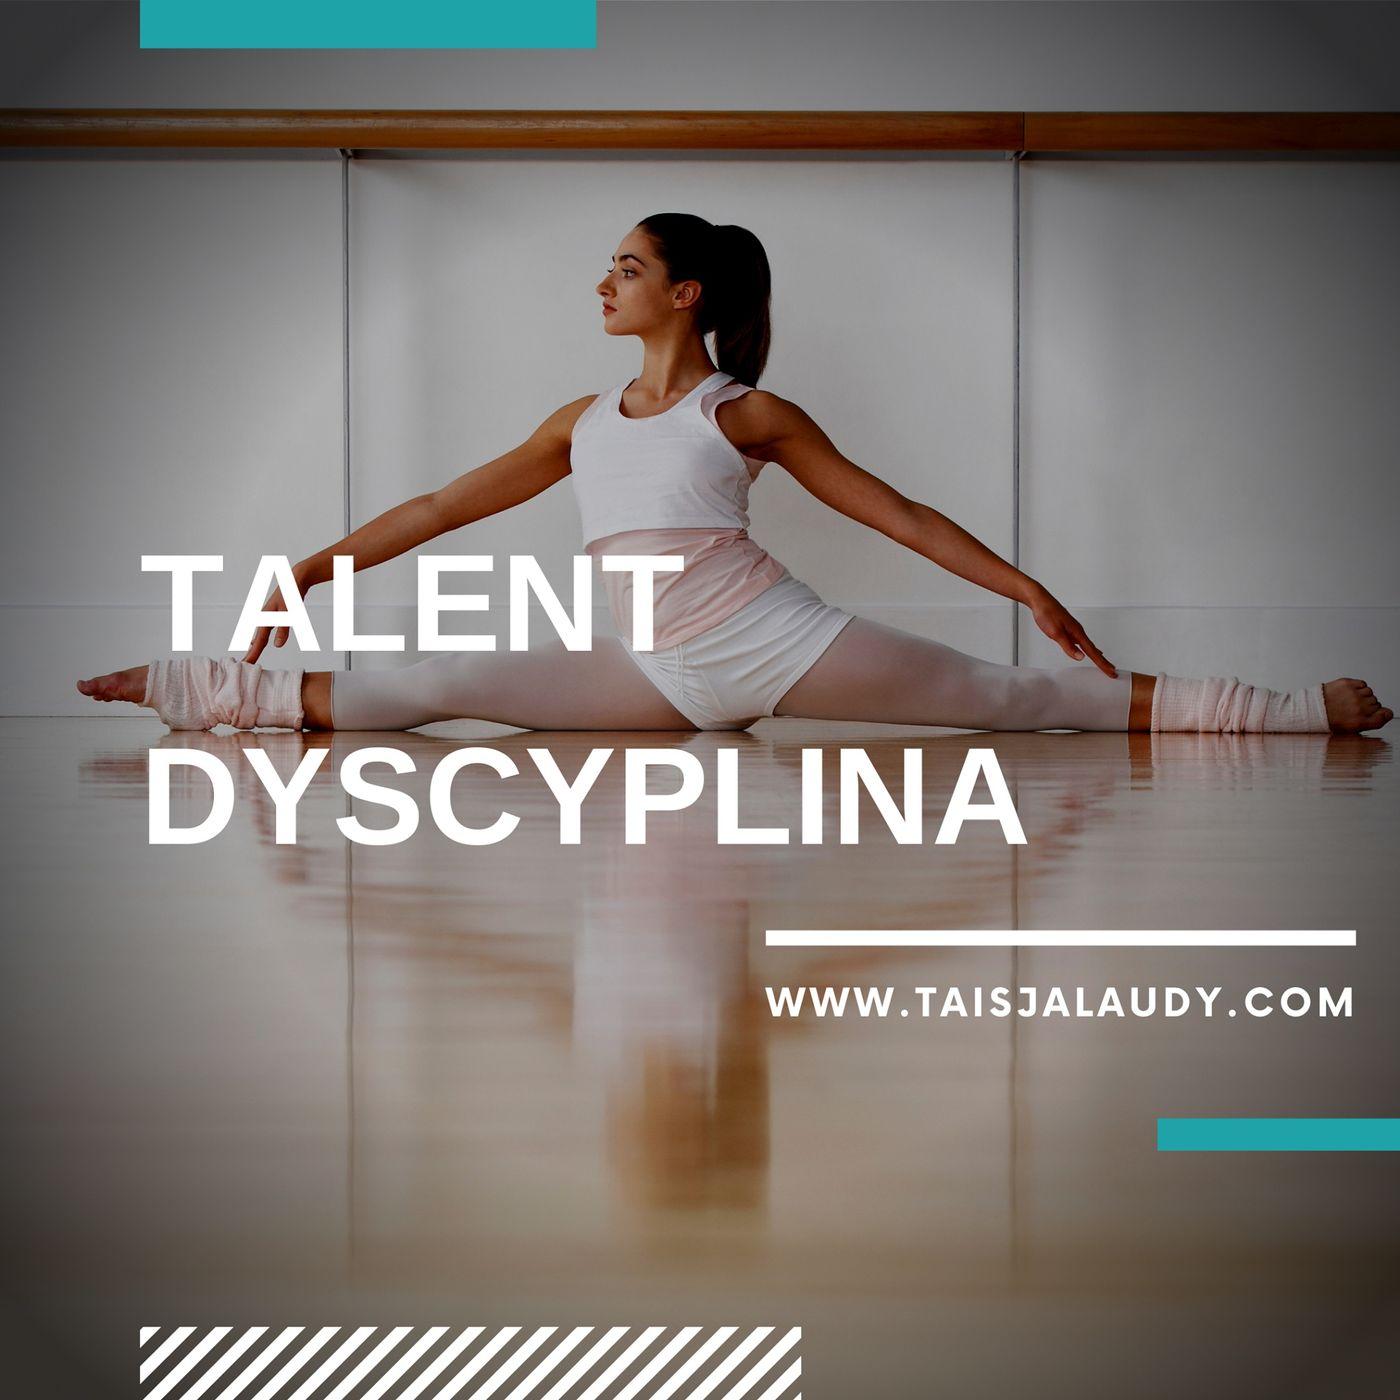 Talent Dyscyplina (Discipline) - Test GALLUPa, Clifton StrengthsFinder 2.0